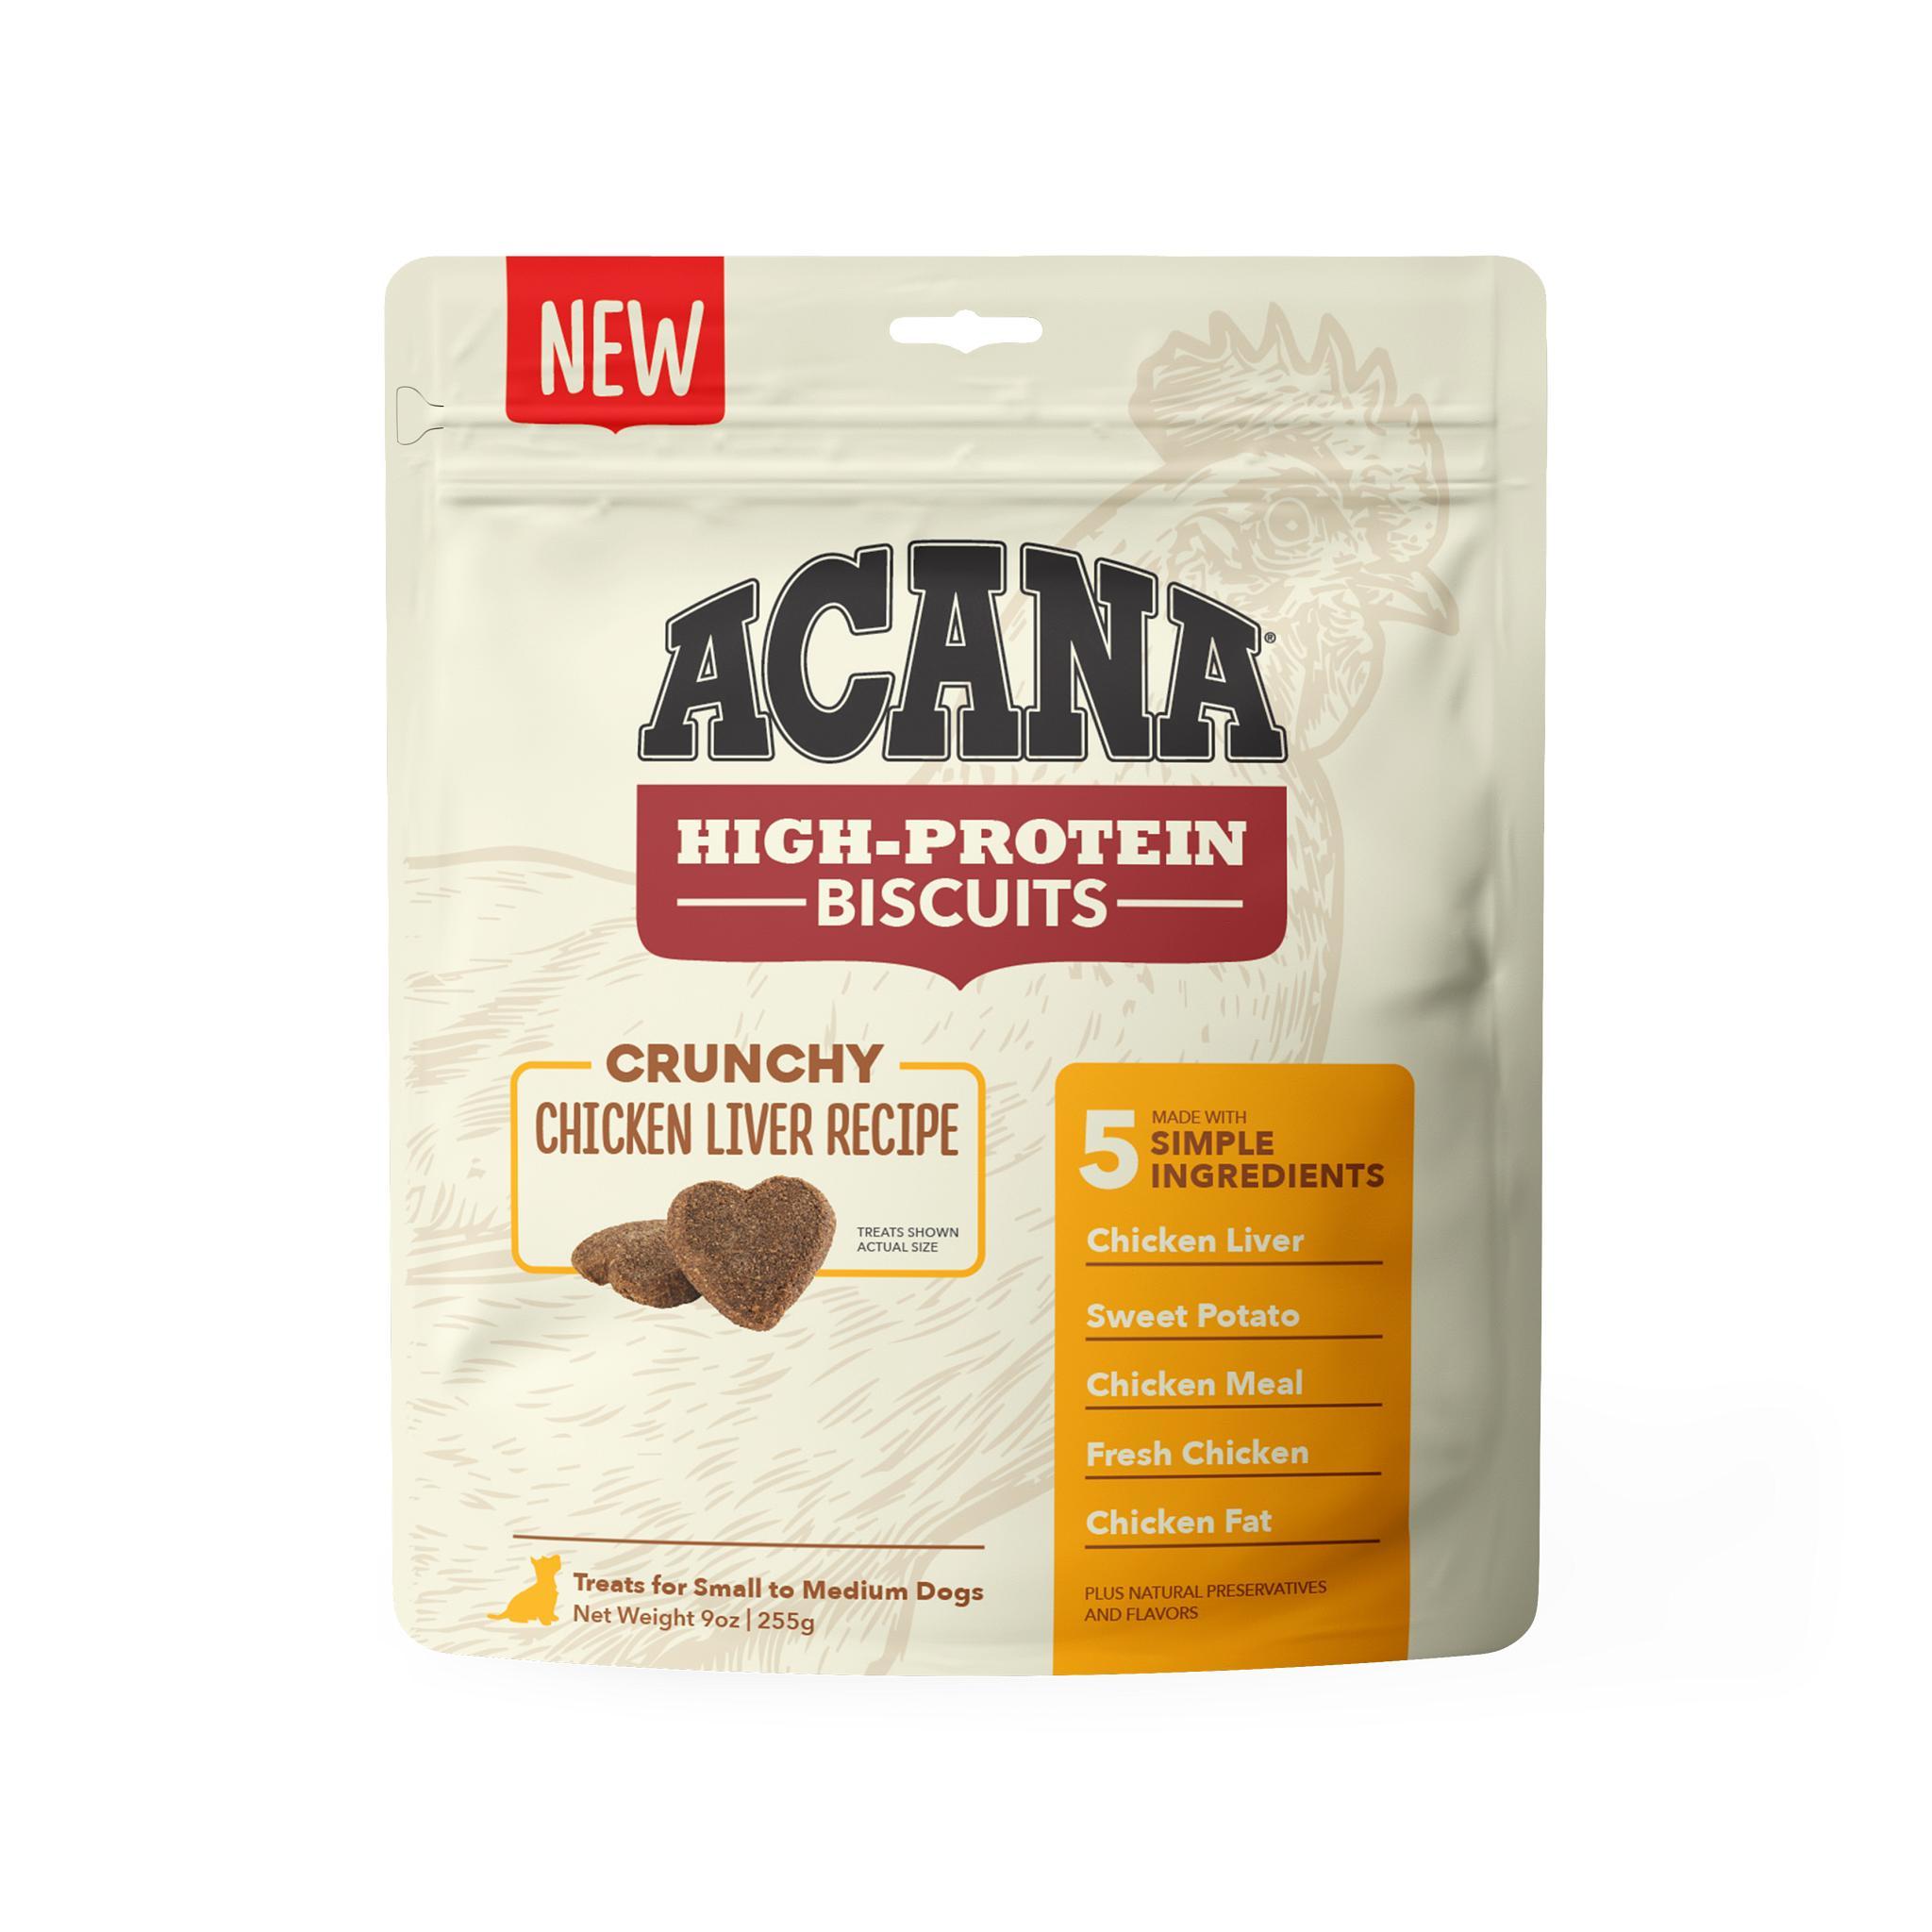 ACANA Crunchy Biscuits Chicken Liver Recipe Dog Treats Image